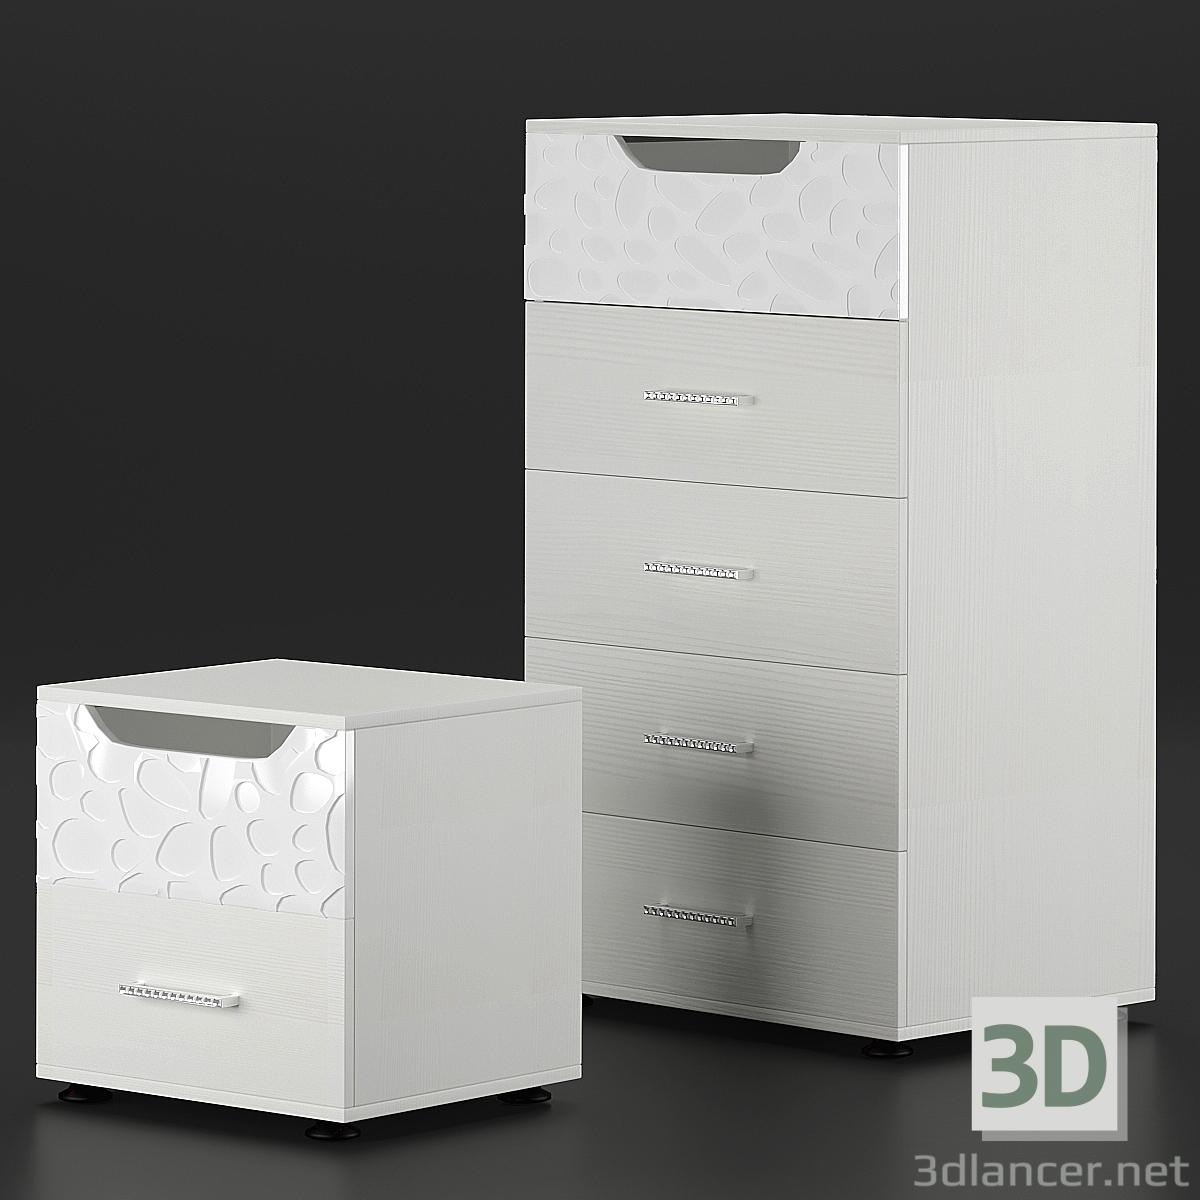 3d Wyspaa.Hoff. Dresser and bedside table model buy - render